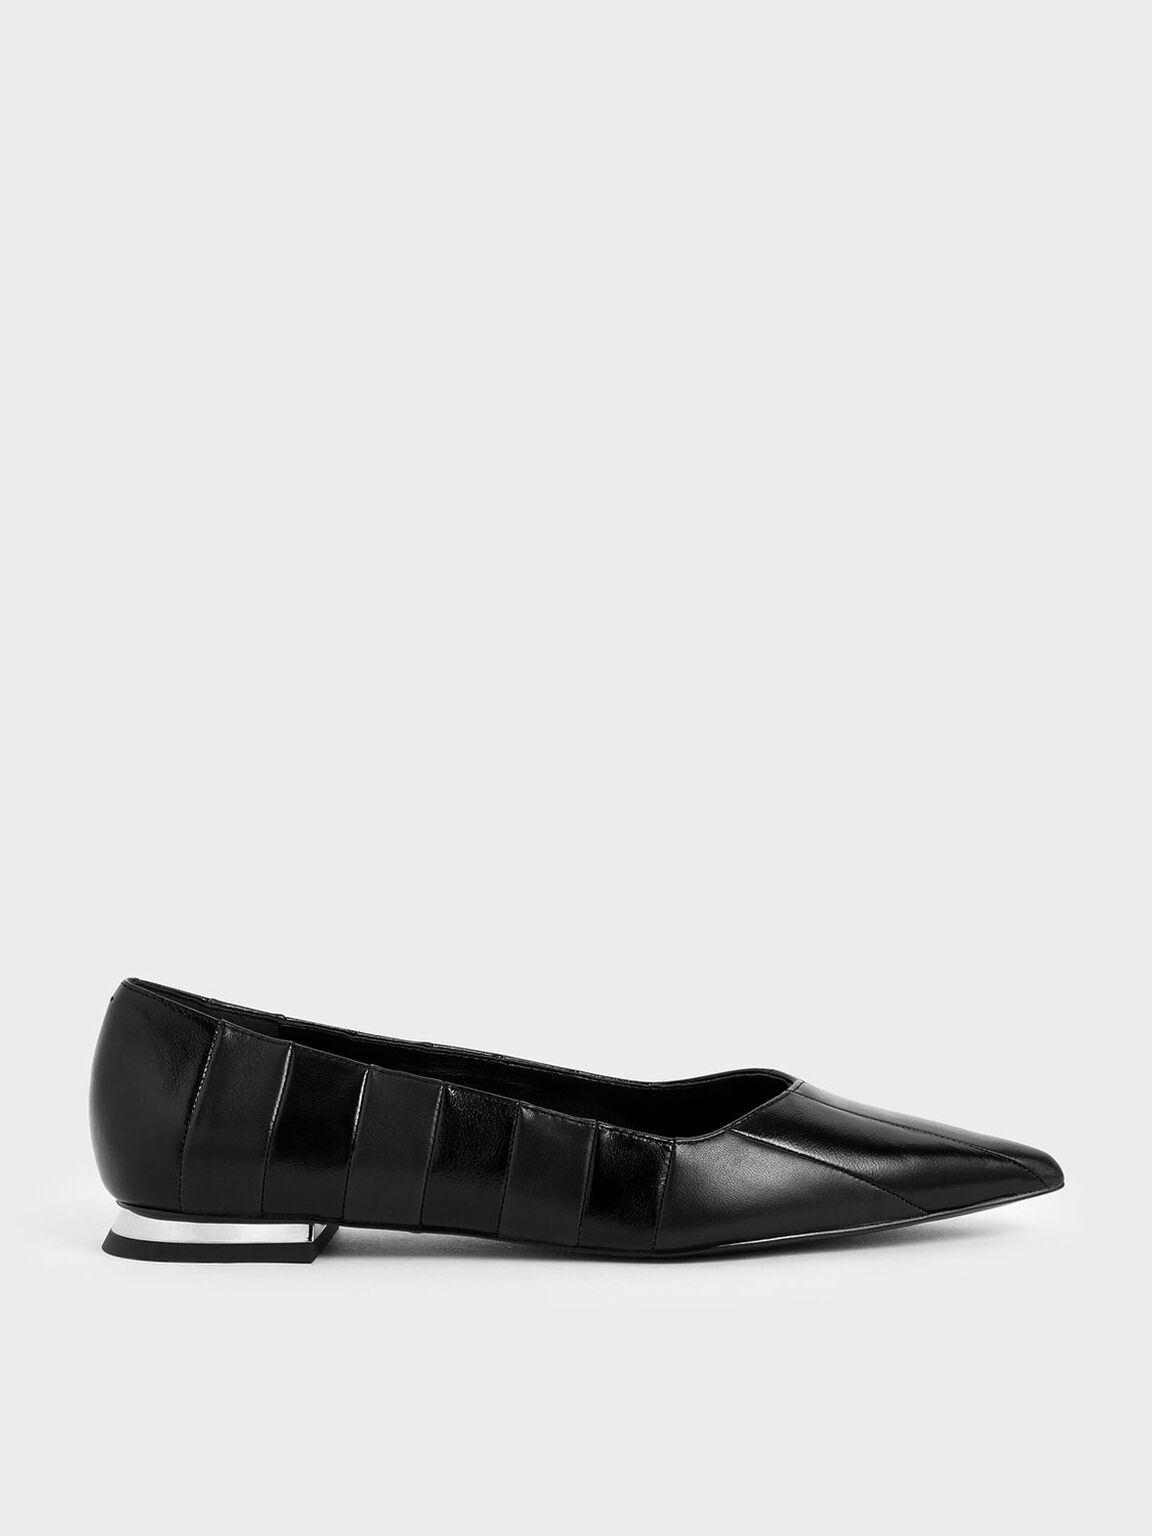 Leather Striped Ballerina Flats, Black, hi-res